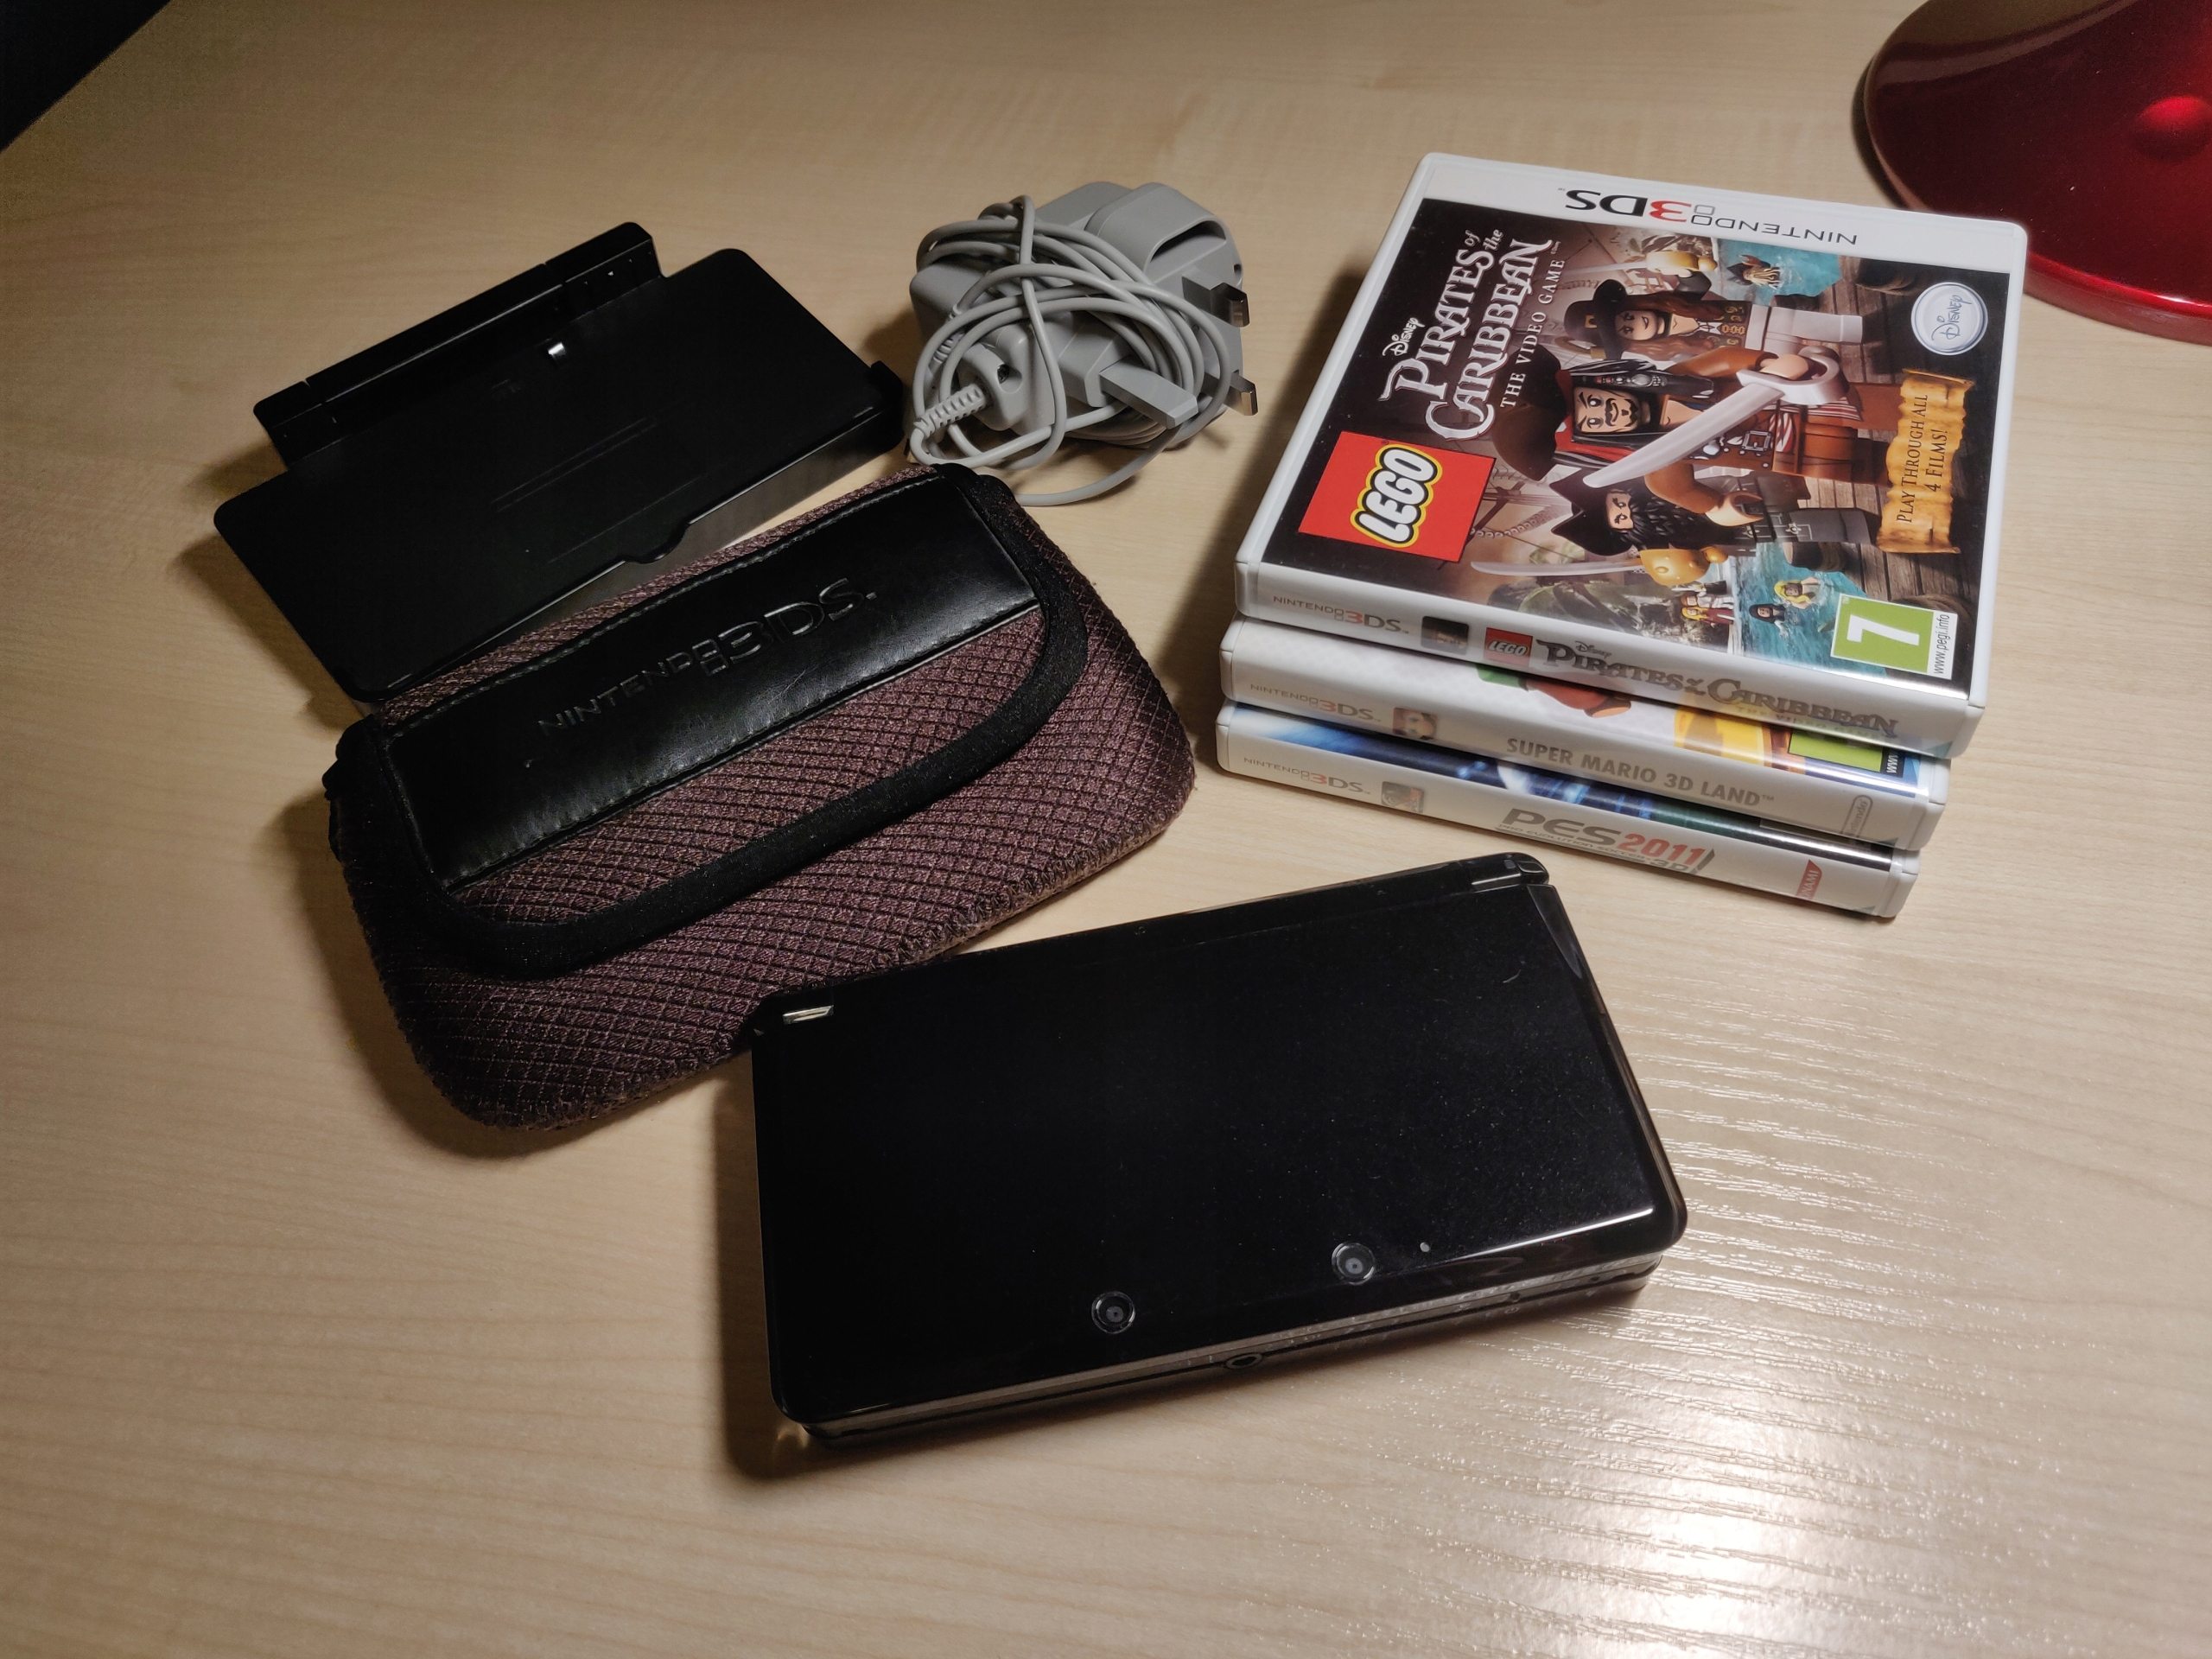 Nintendo 3DS + gry i akcesoria